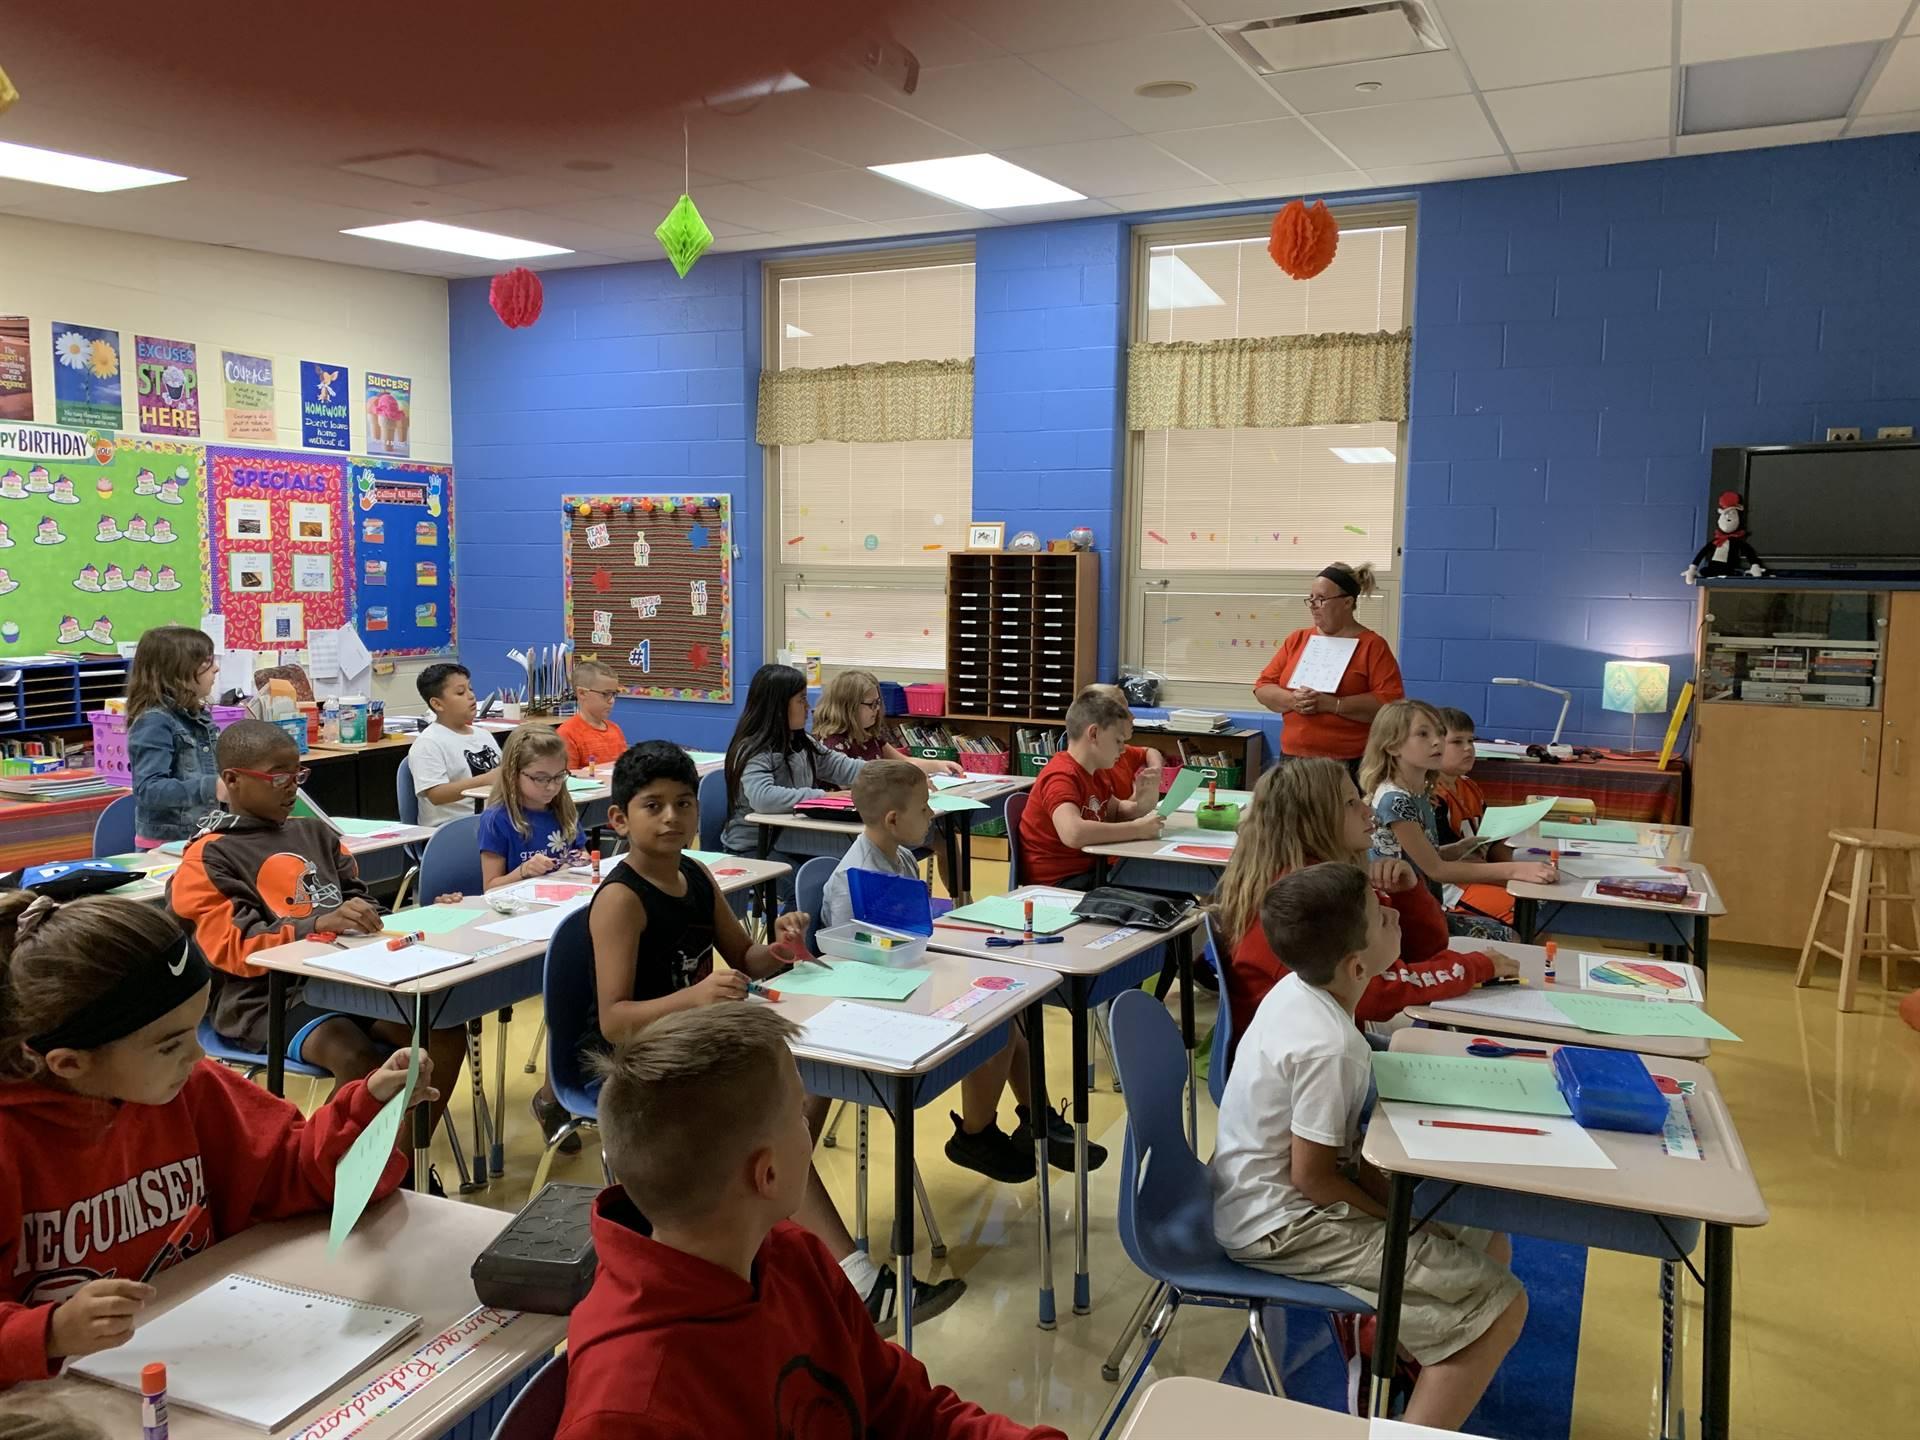 Mrs. Cooper's classroom